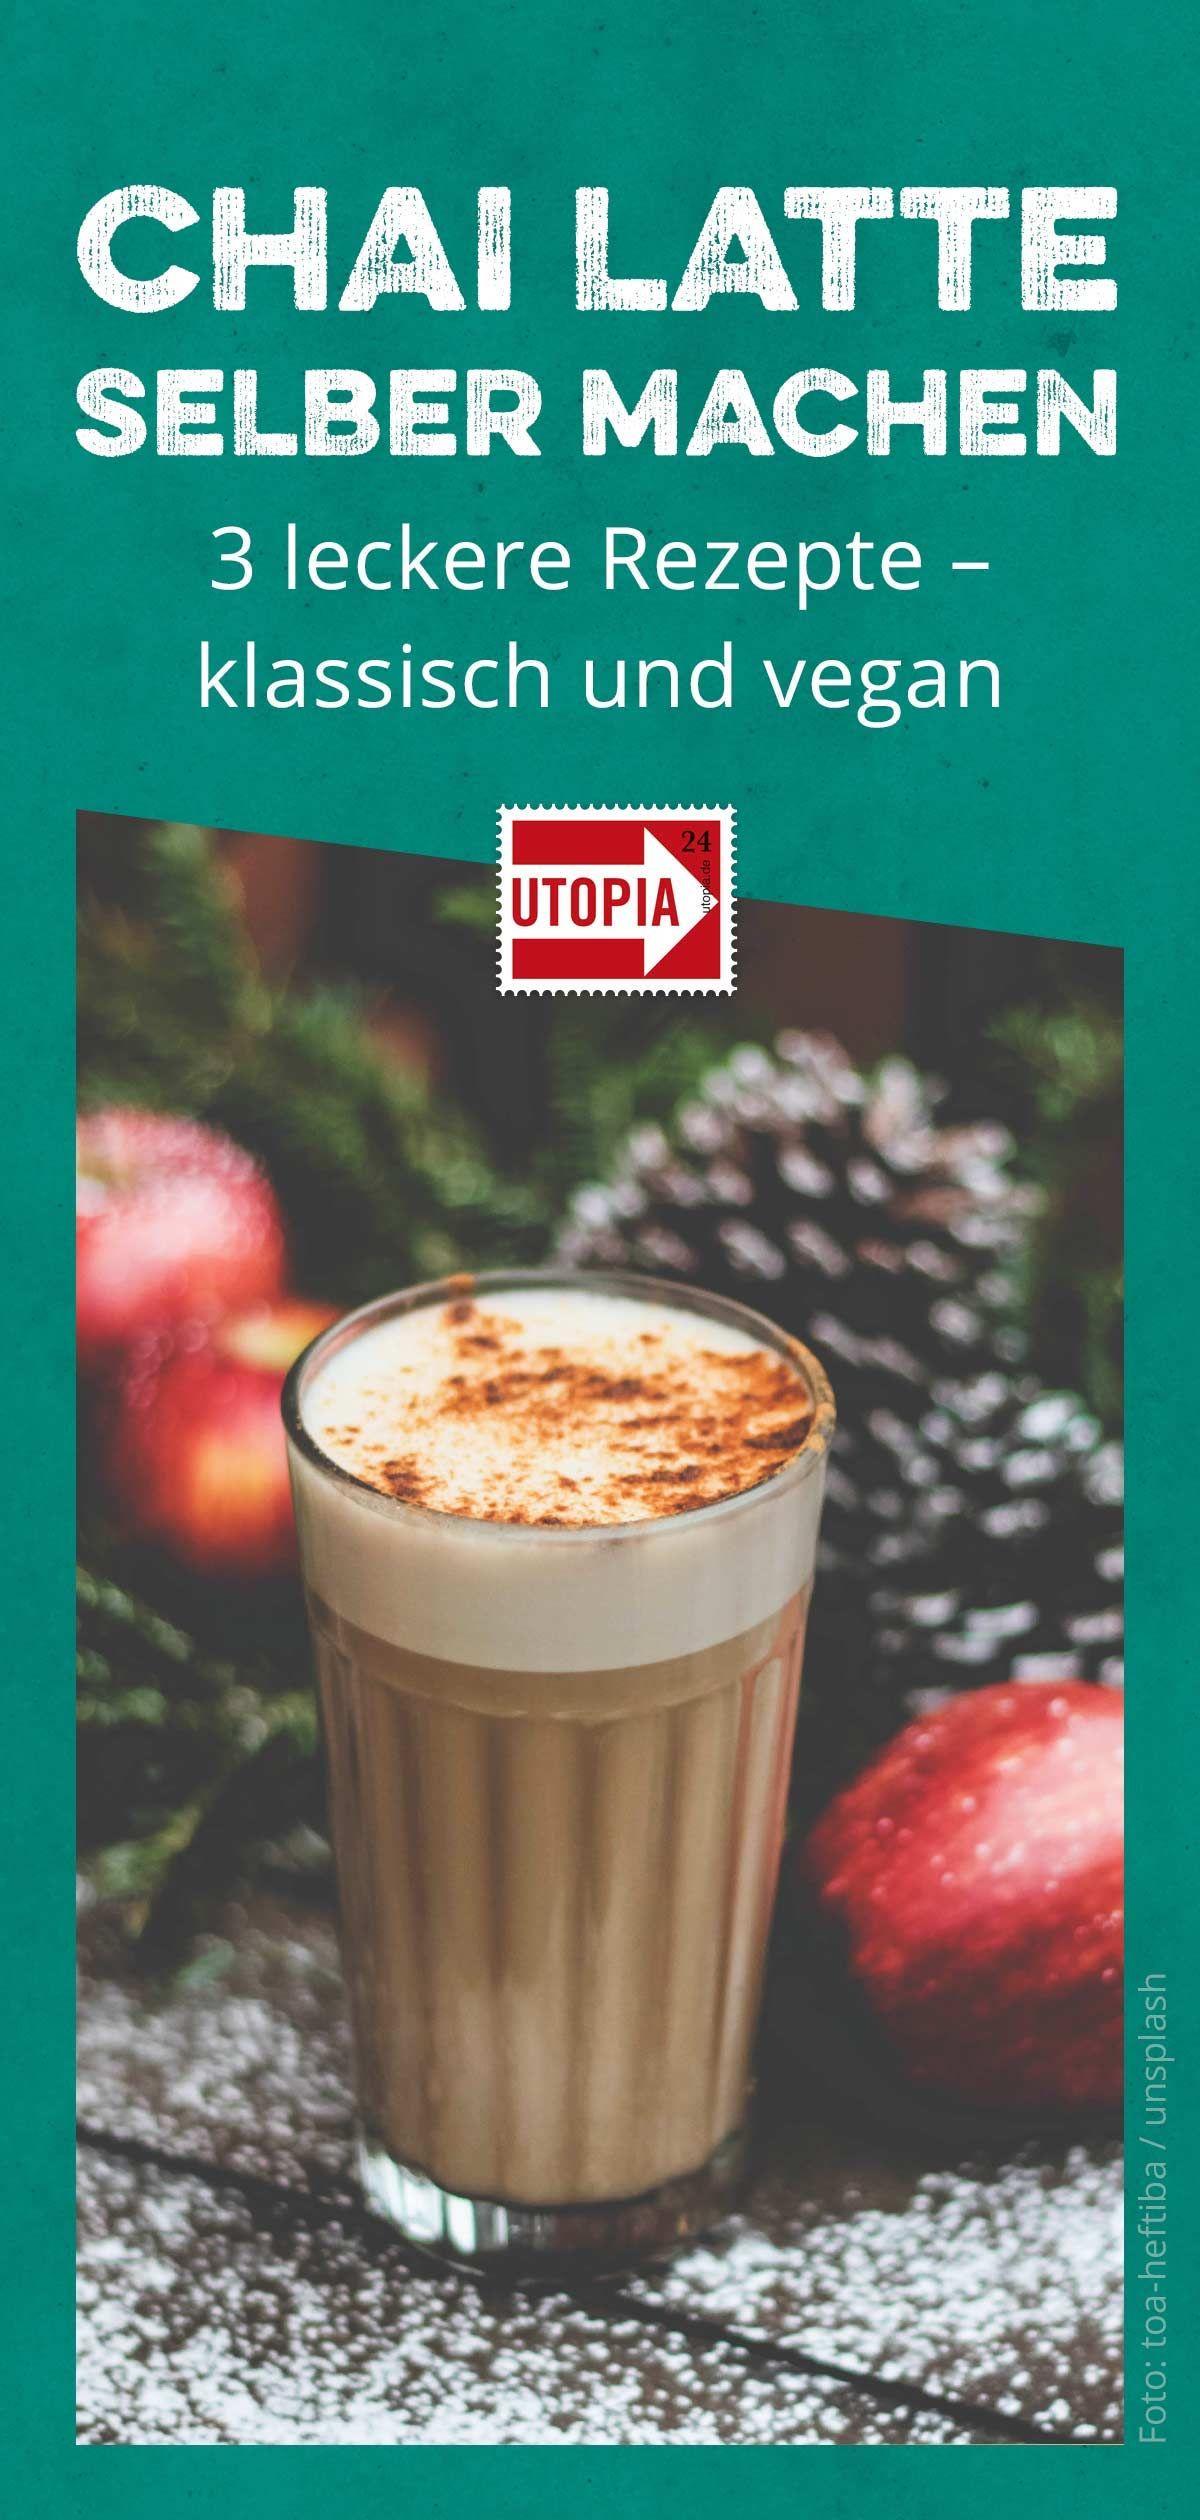 Chai Latte selber machen: 3 leckere Rezepte - klassisch und vegan - Utopia.de